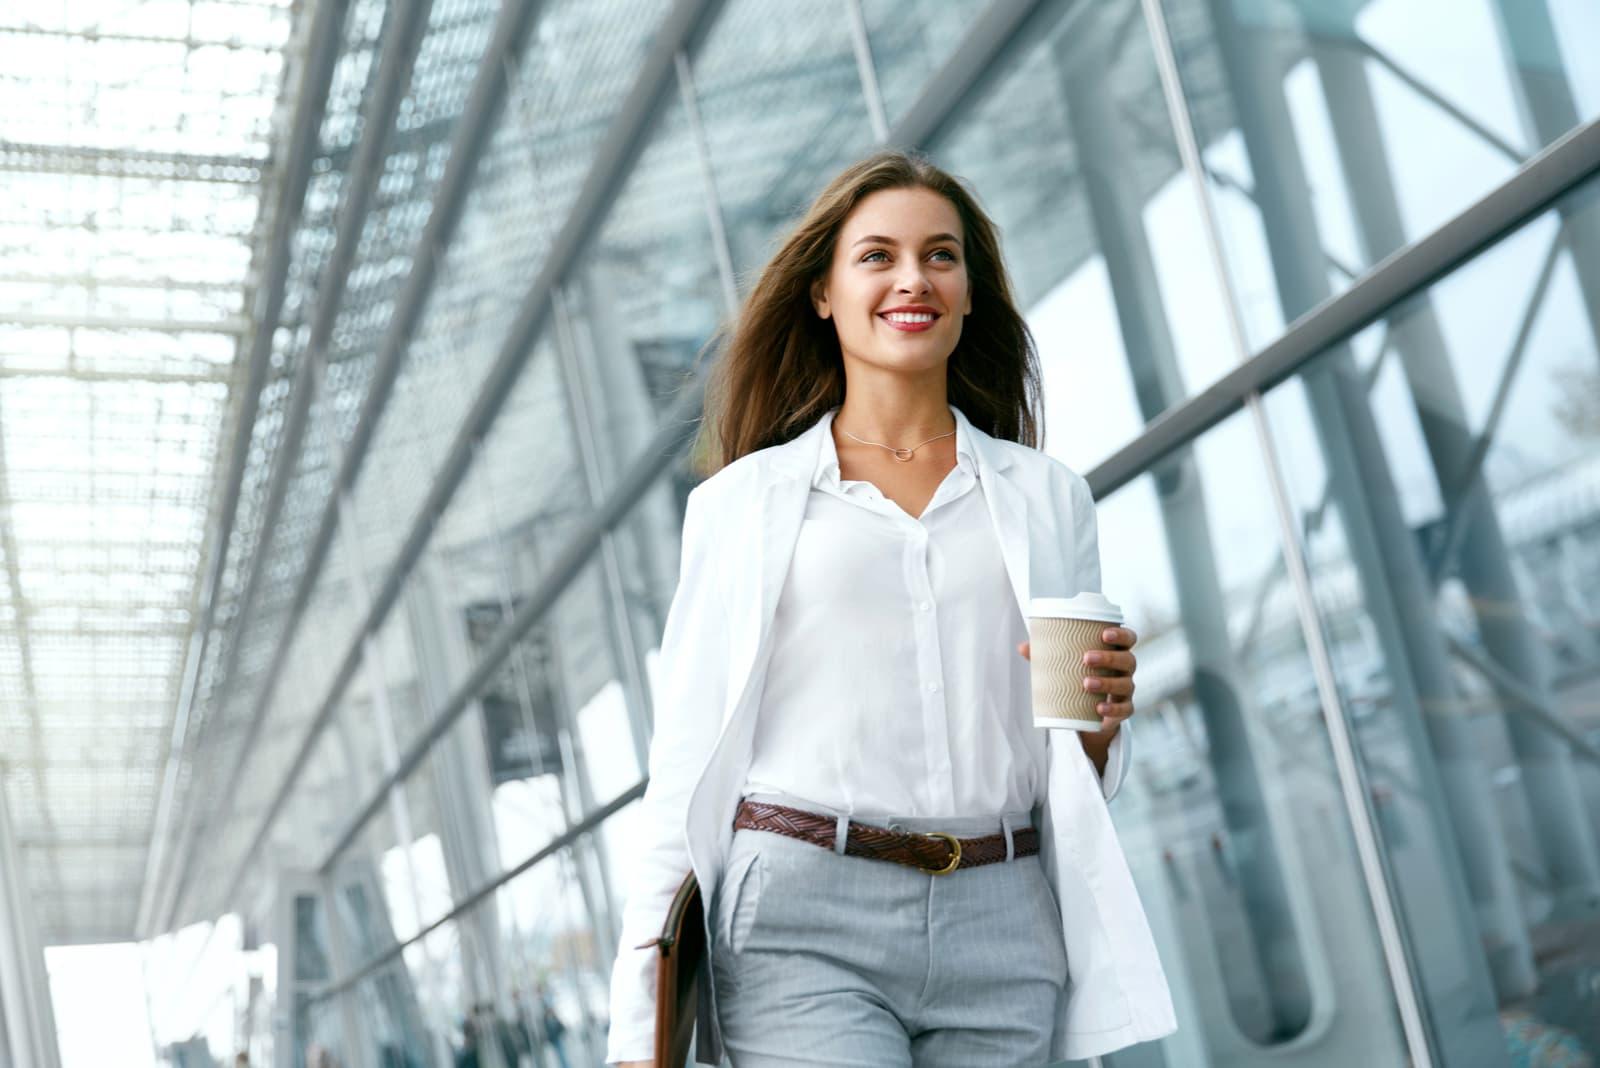 confident business woman walking